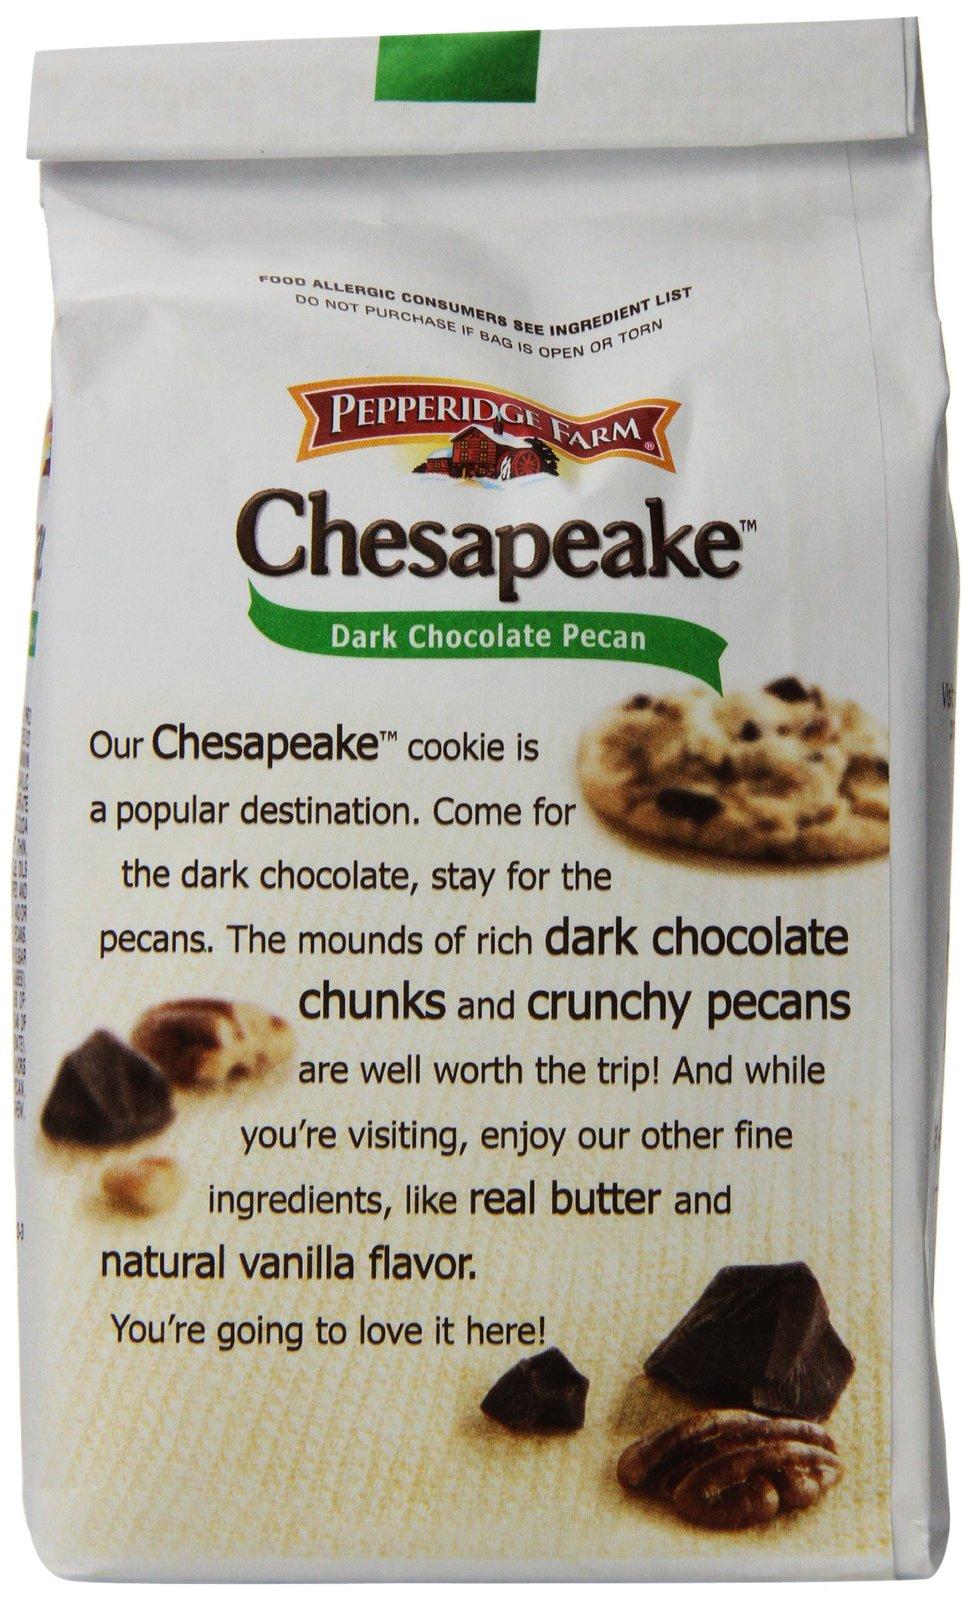 Pepperidge Farm Chesapeake, Crispy, Cookies, Dark Chocolate Pecan, 7.2 oz, Bag,  image 6